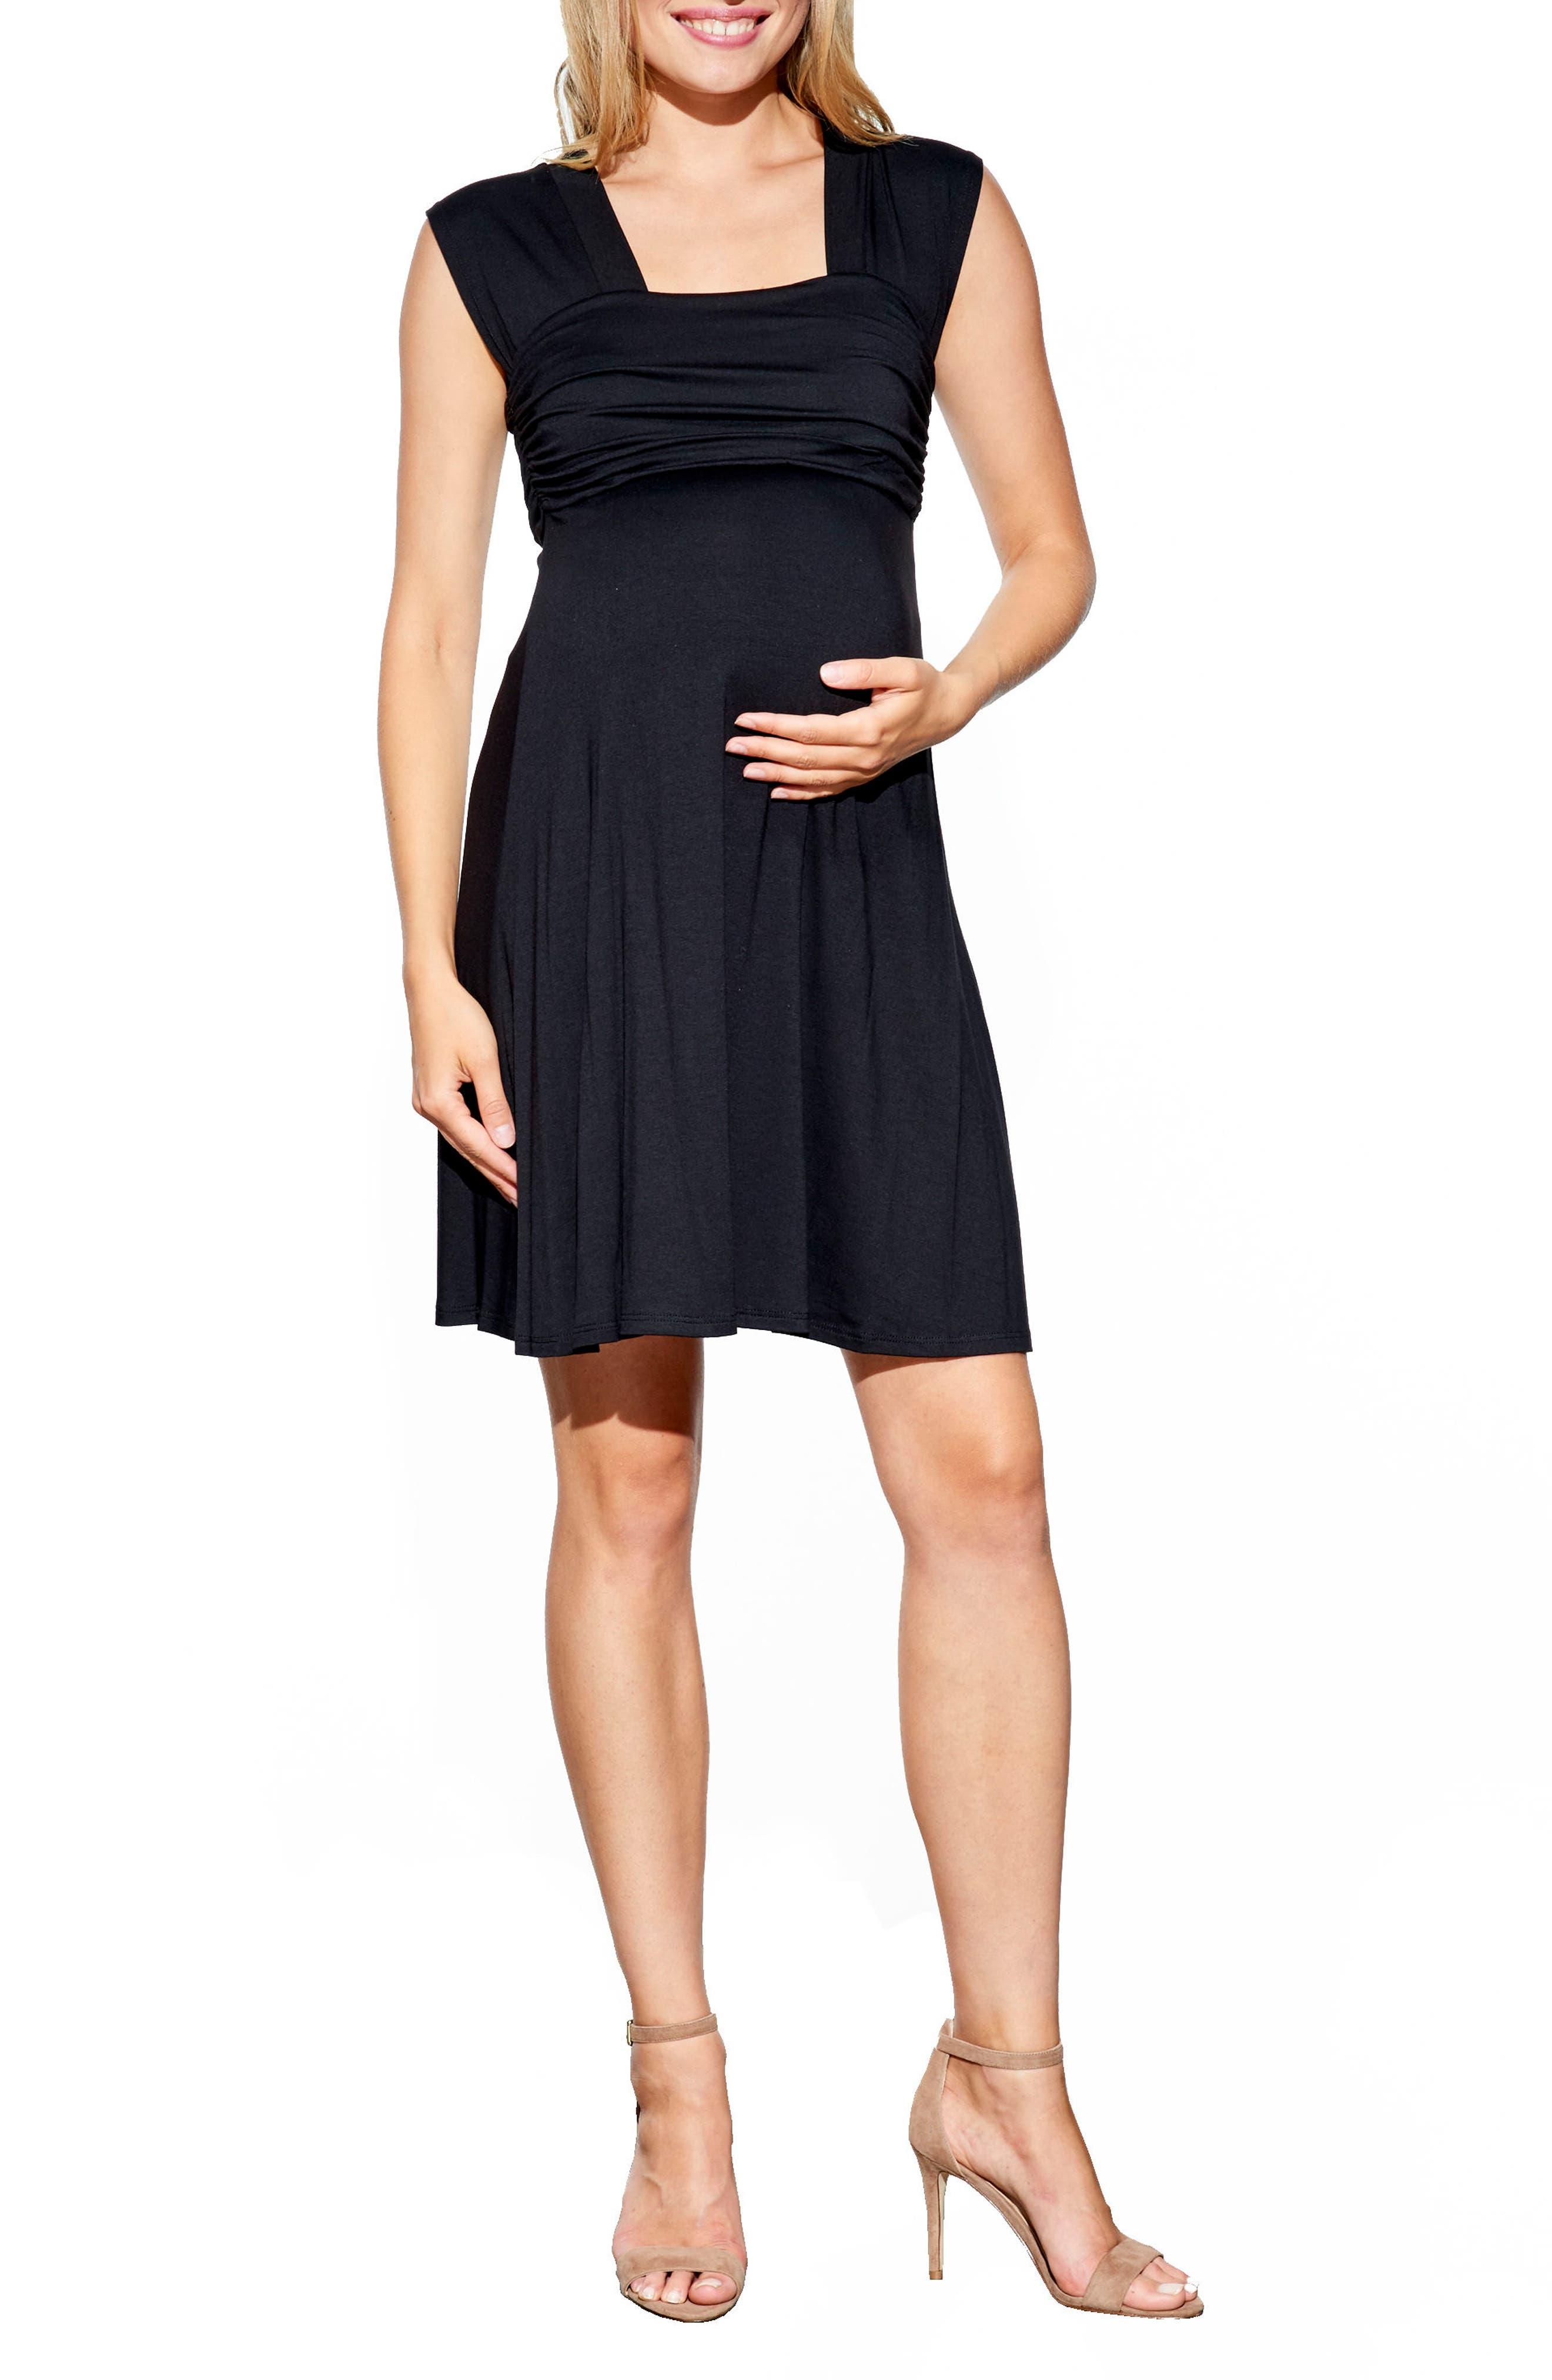 MATERNAL AMERICA 'Mini Sweetheart' Dress, Main, color, BLACK